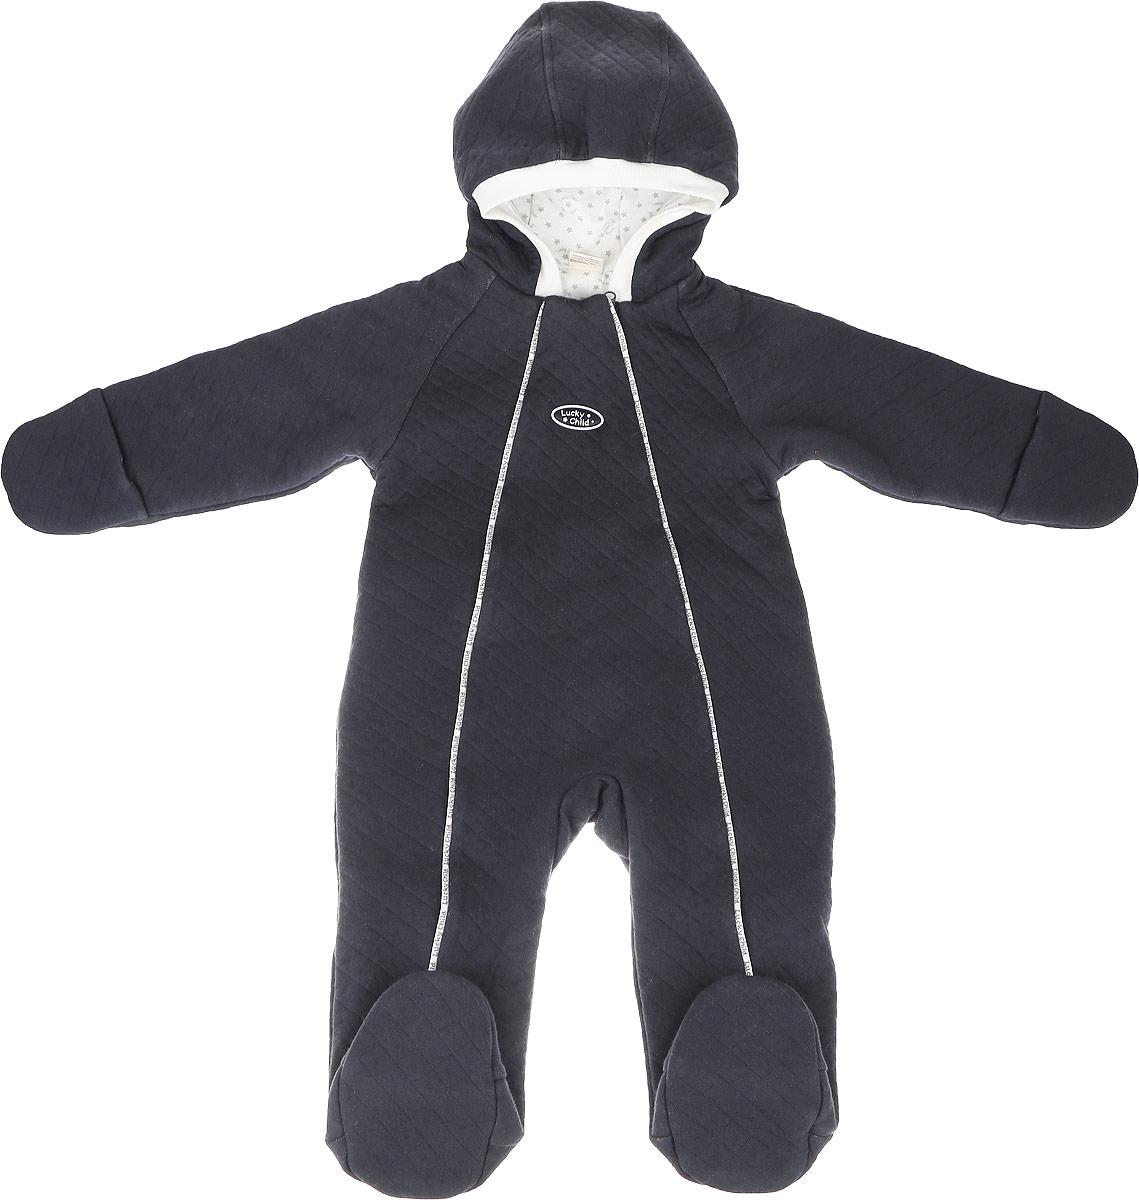 Комбинезон детский Lucky Child, цвет: темно-синий. 33-6. Размер 74/80 чехол для meizu m3 note gecko flip белый